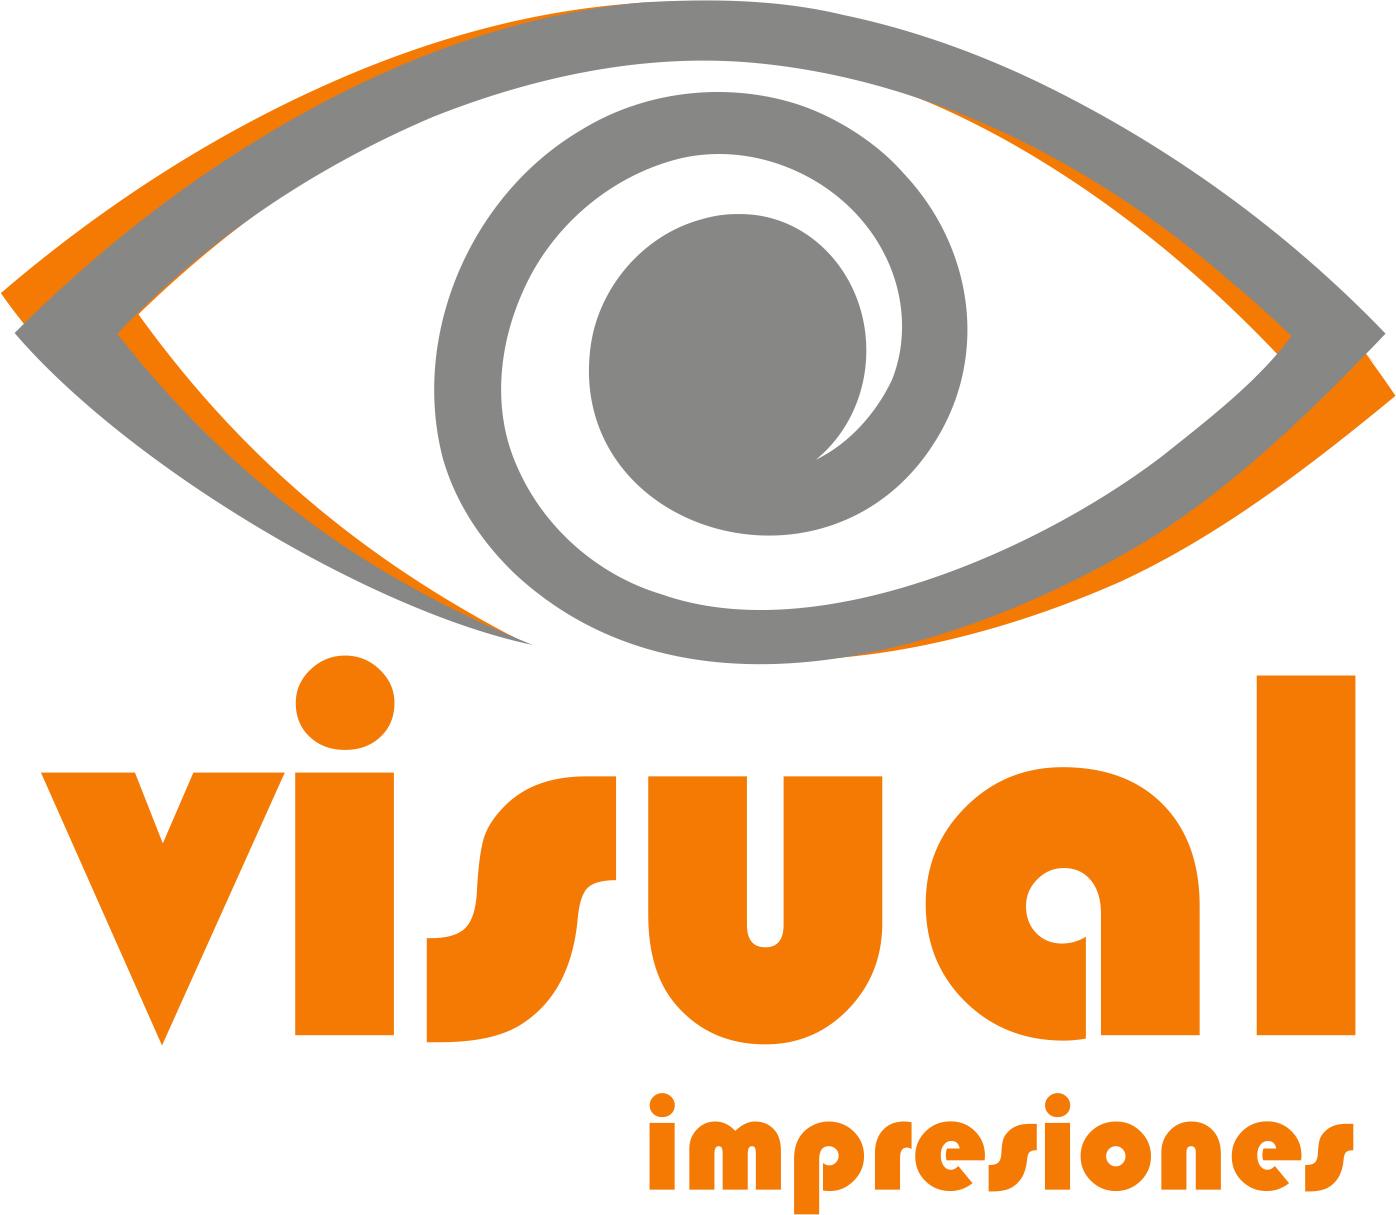 logo visual - Visual Impresiones